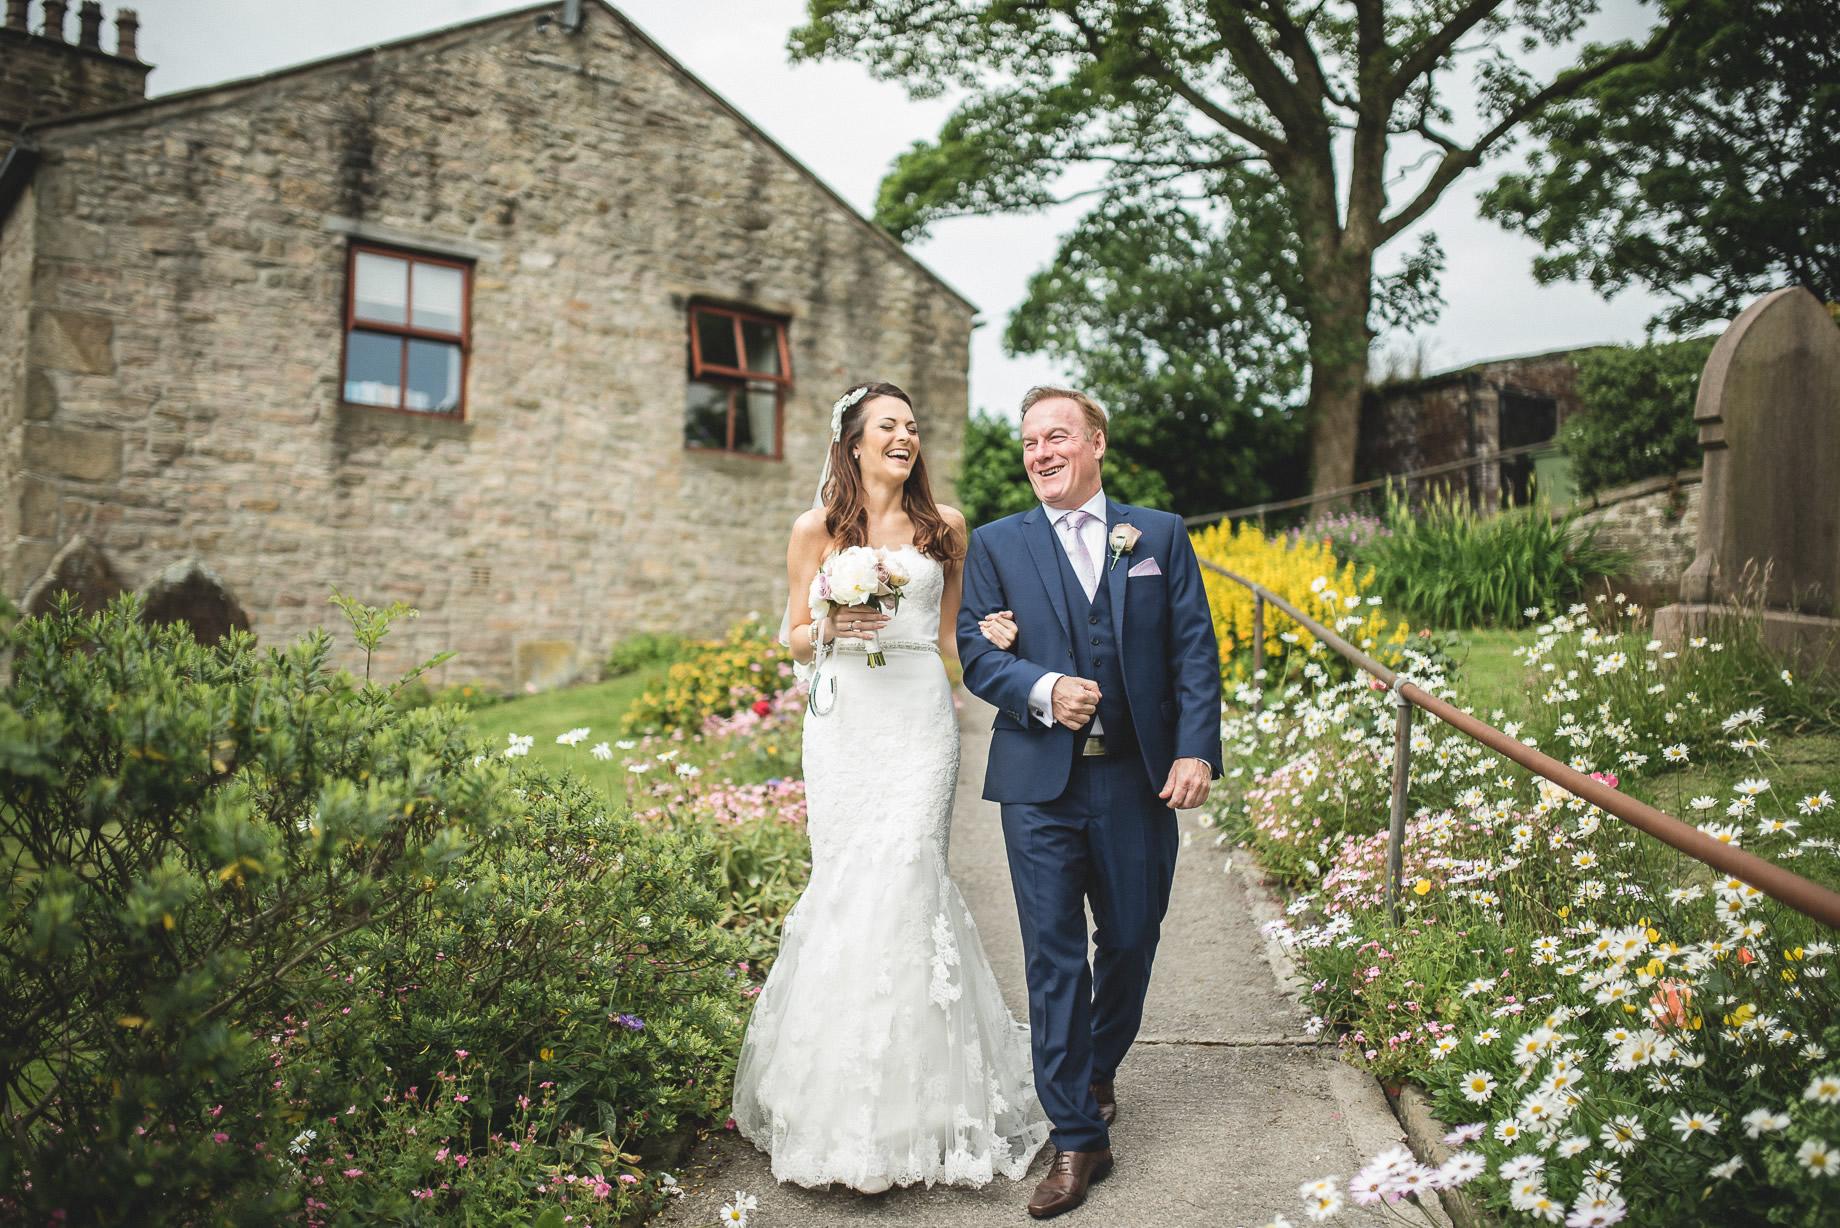 Helen and Matt's Wedding at Mitton Hall 032